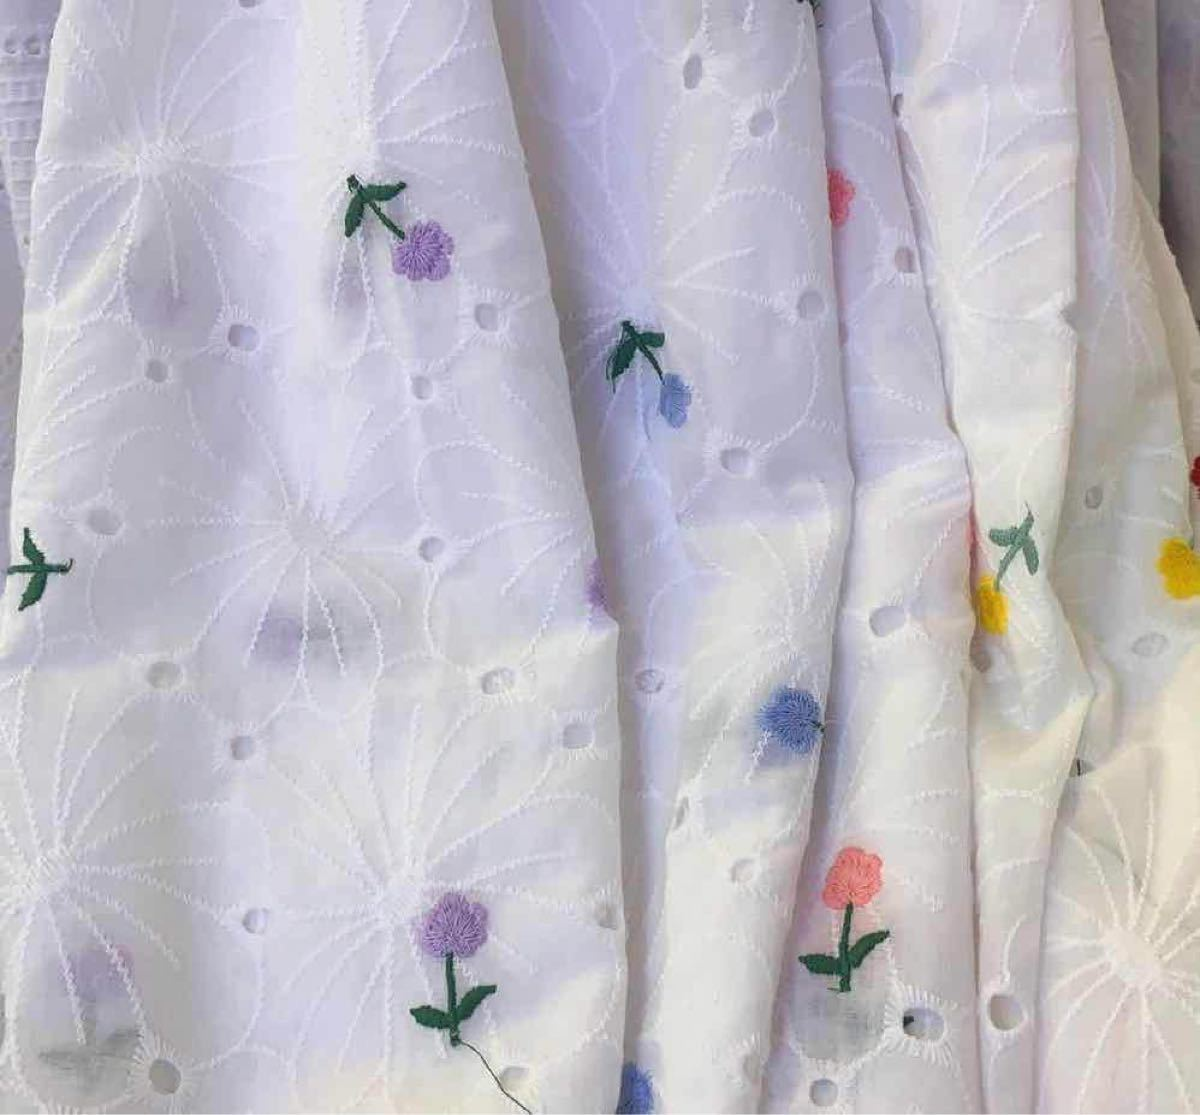 A003 綿100% カット 花柄 刺繍 綿レース生地130cm*50cm